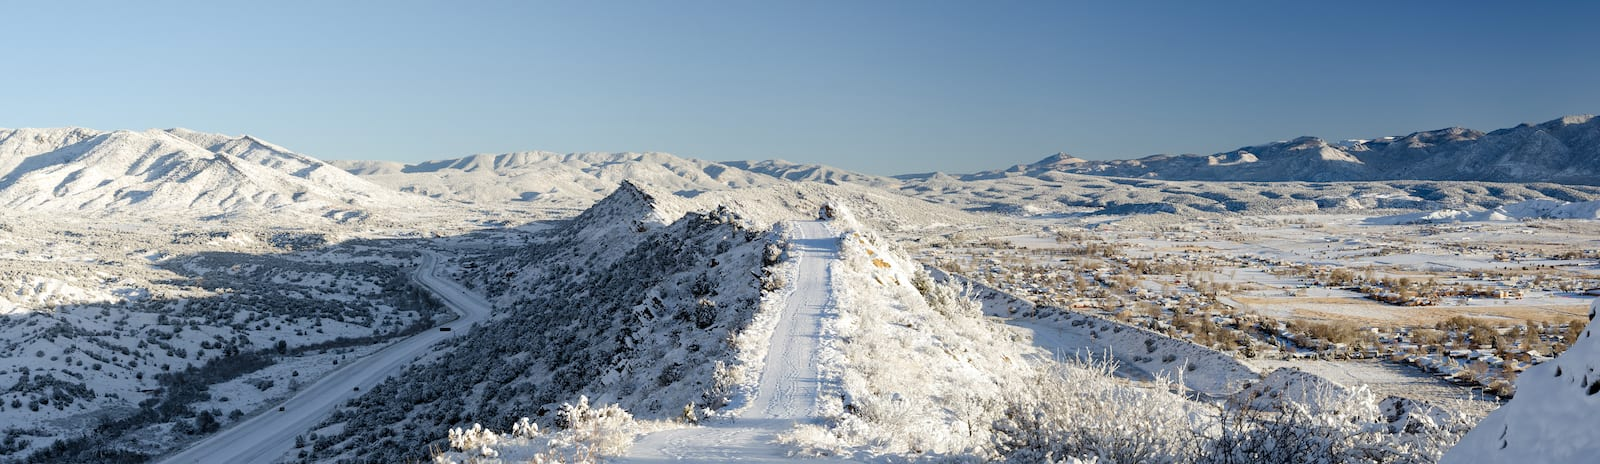 Skyline Drive in Cañon City Colorado Winter Driving